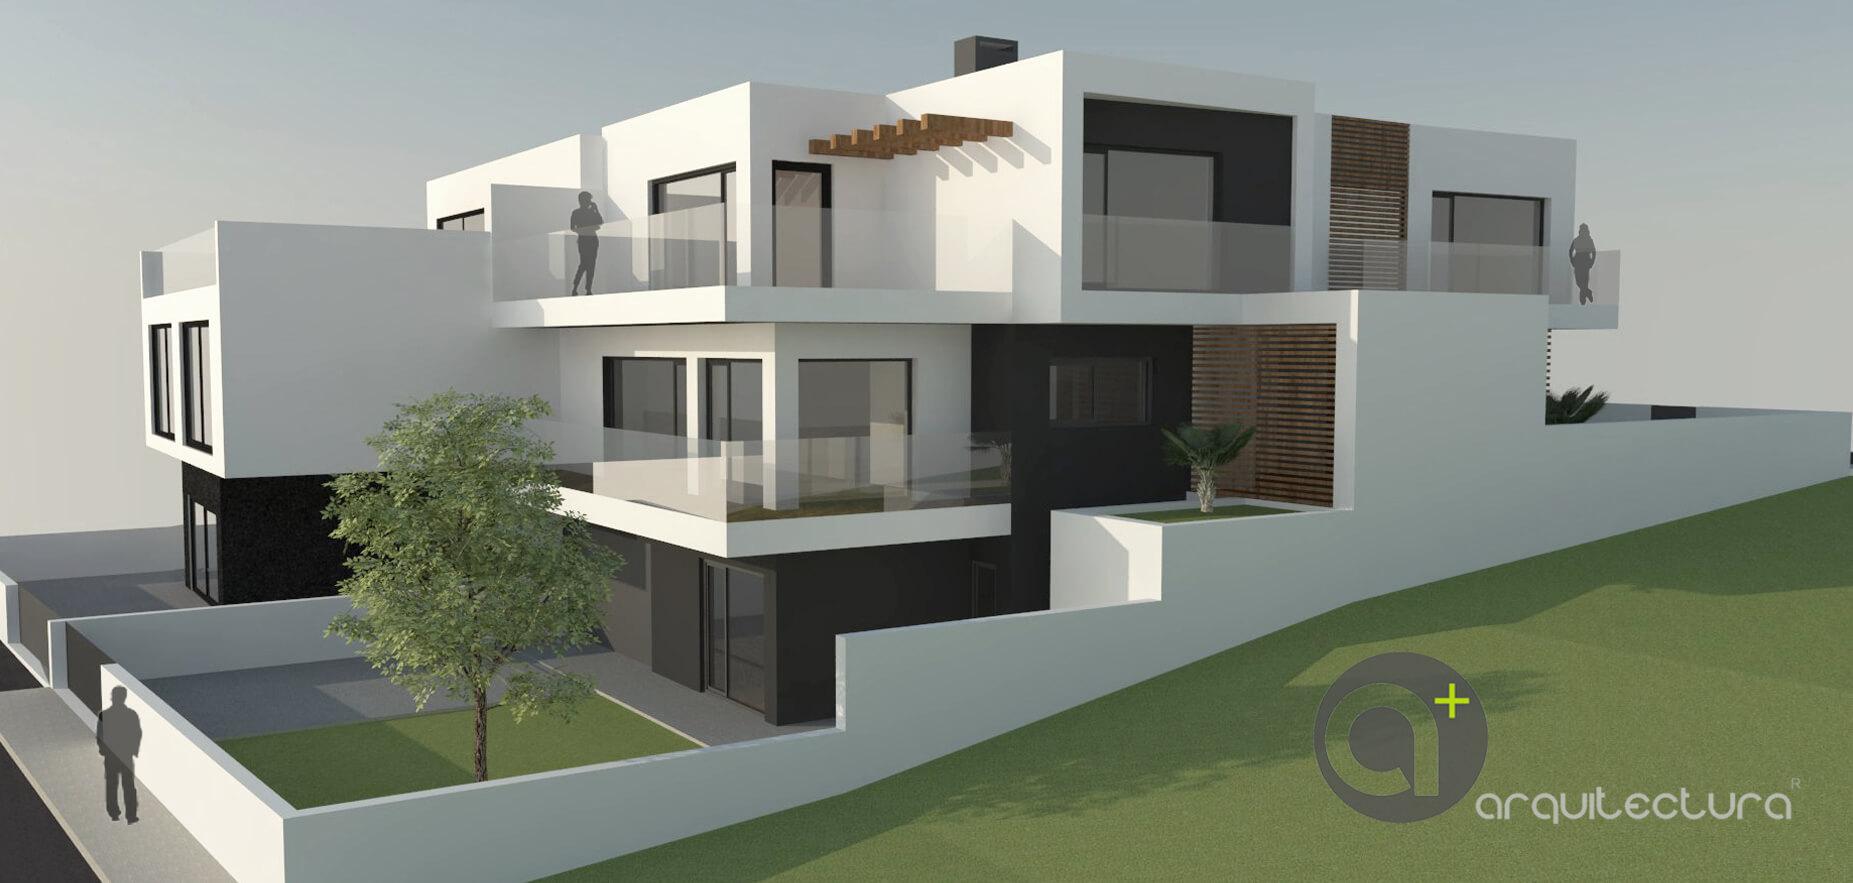 a+ arquitectura